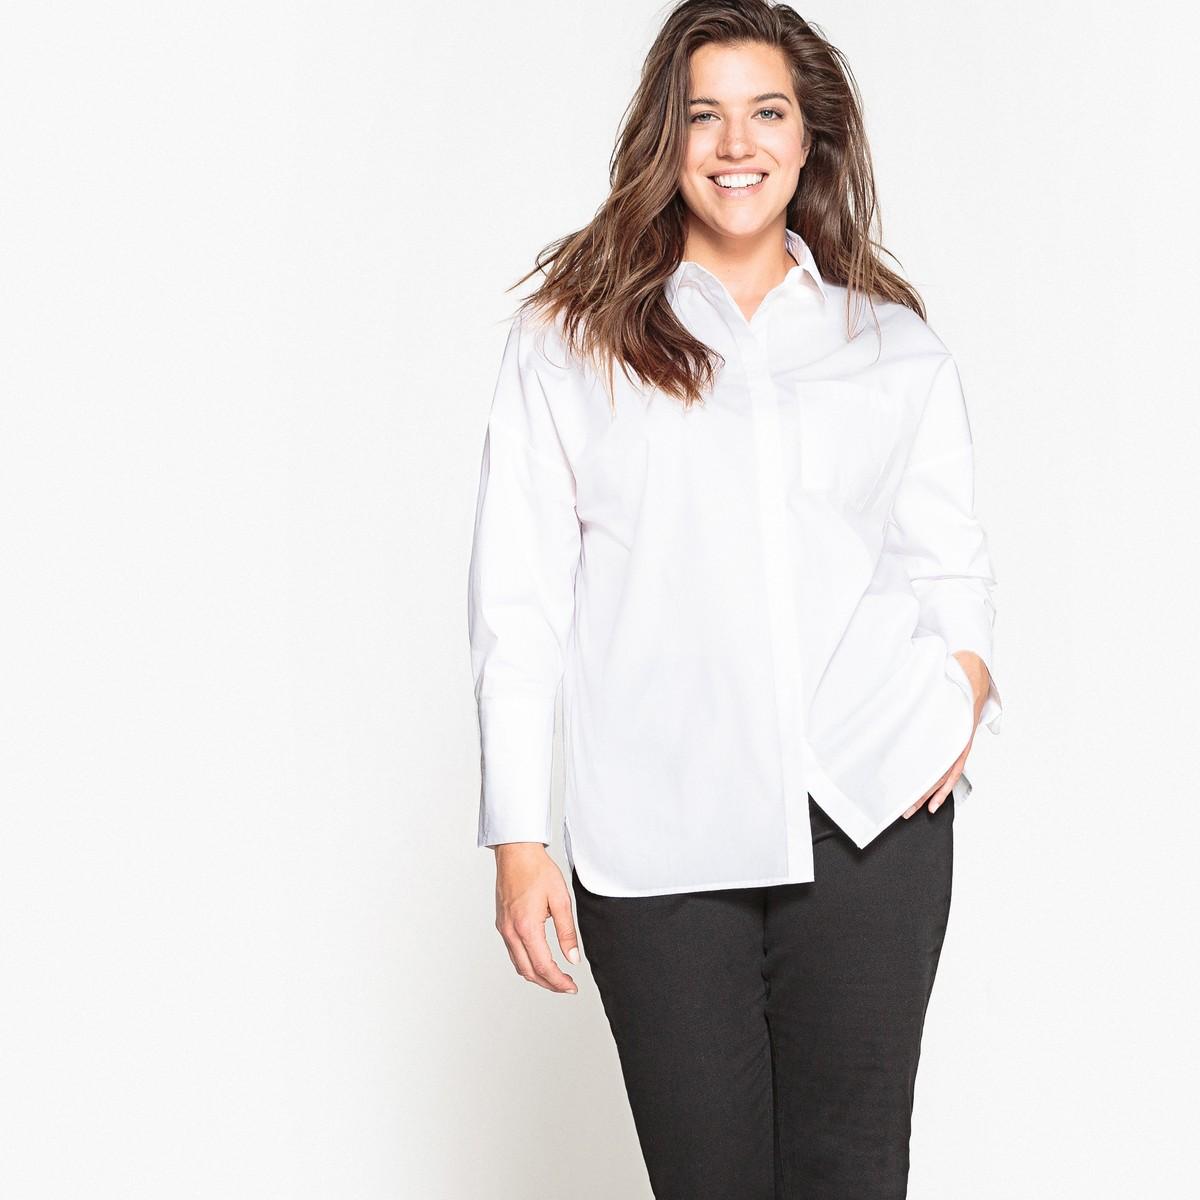 bc7ef9671862 CASTALUNA Μονόχρωμο πουκάμισο με τσέπη - Glami.gr